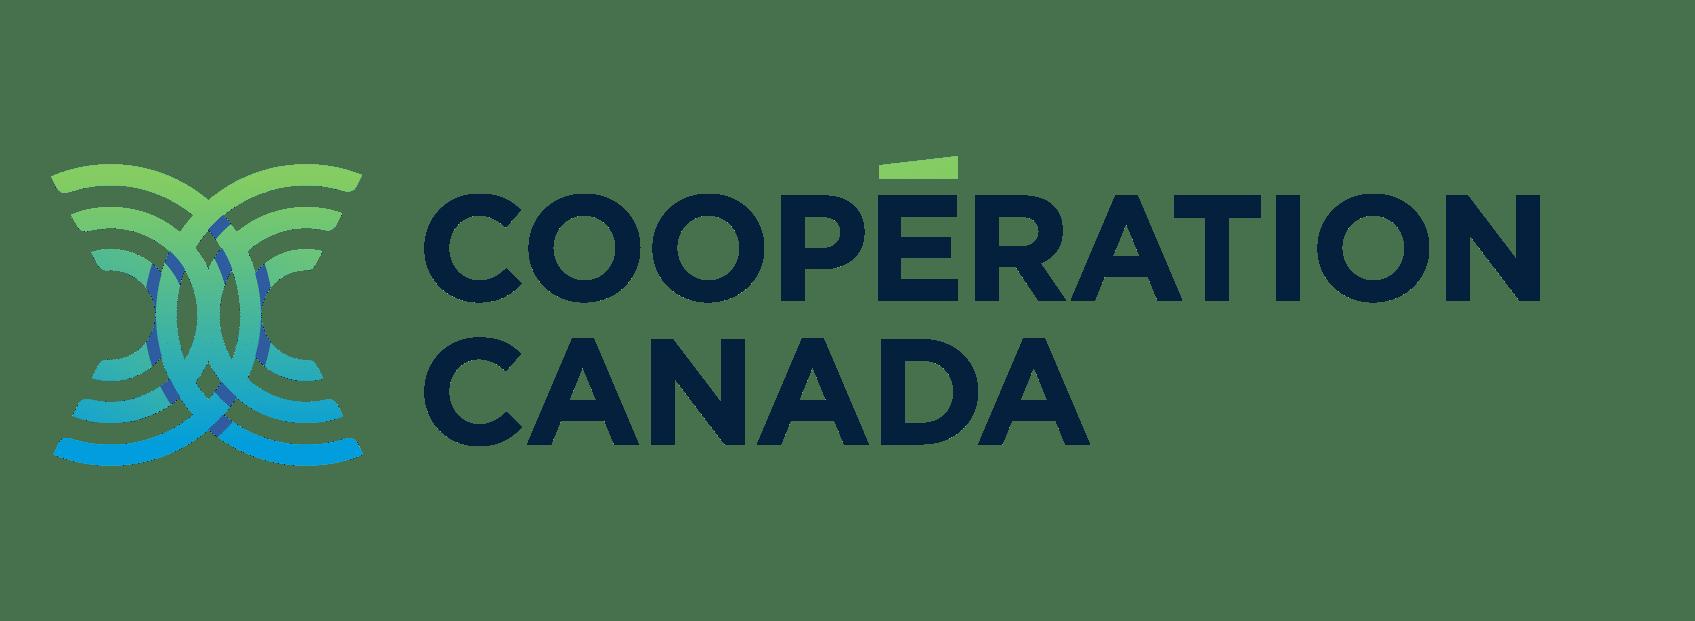 Cooperation Canada logo